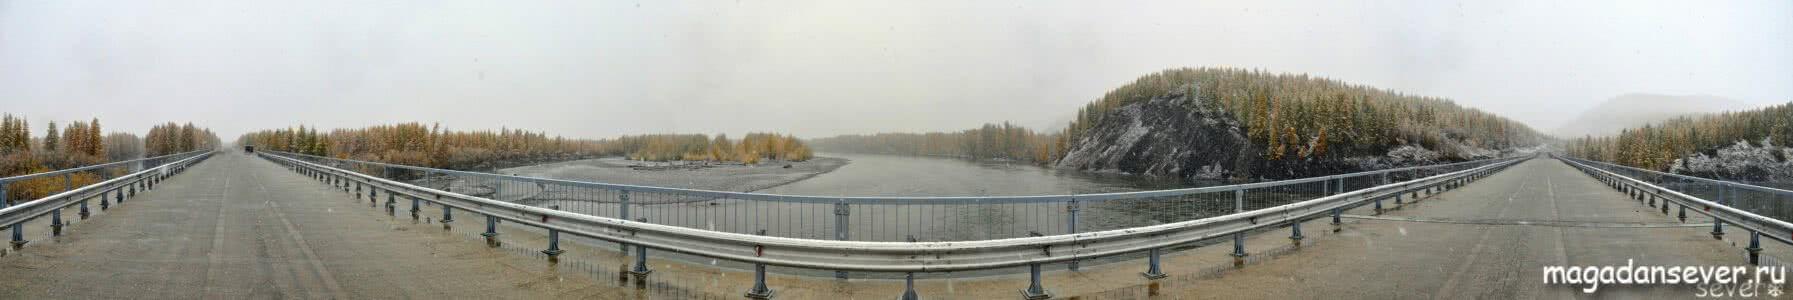 Панорама, мост через Кулу